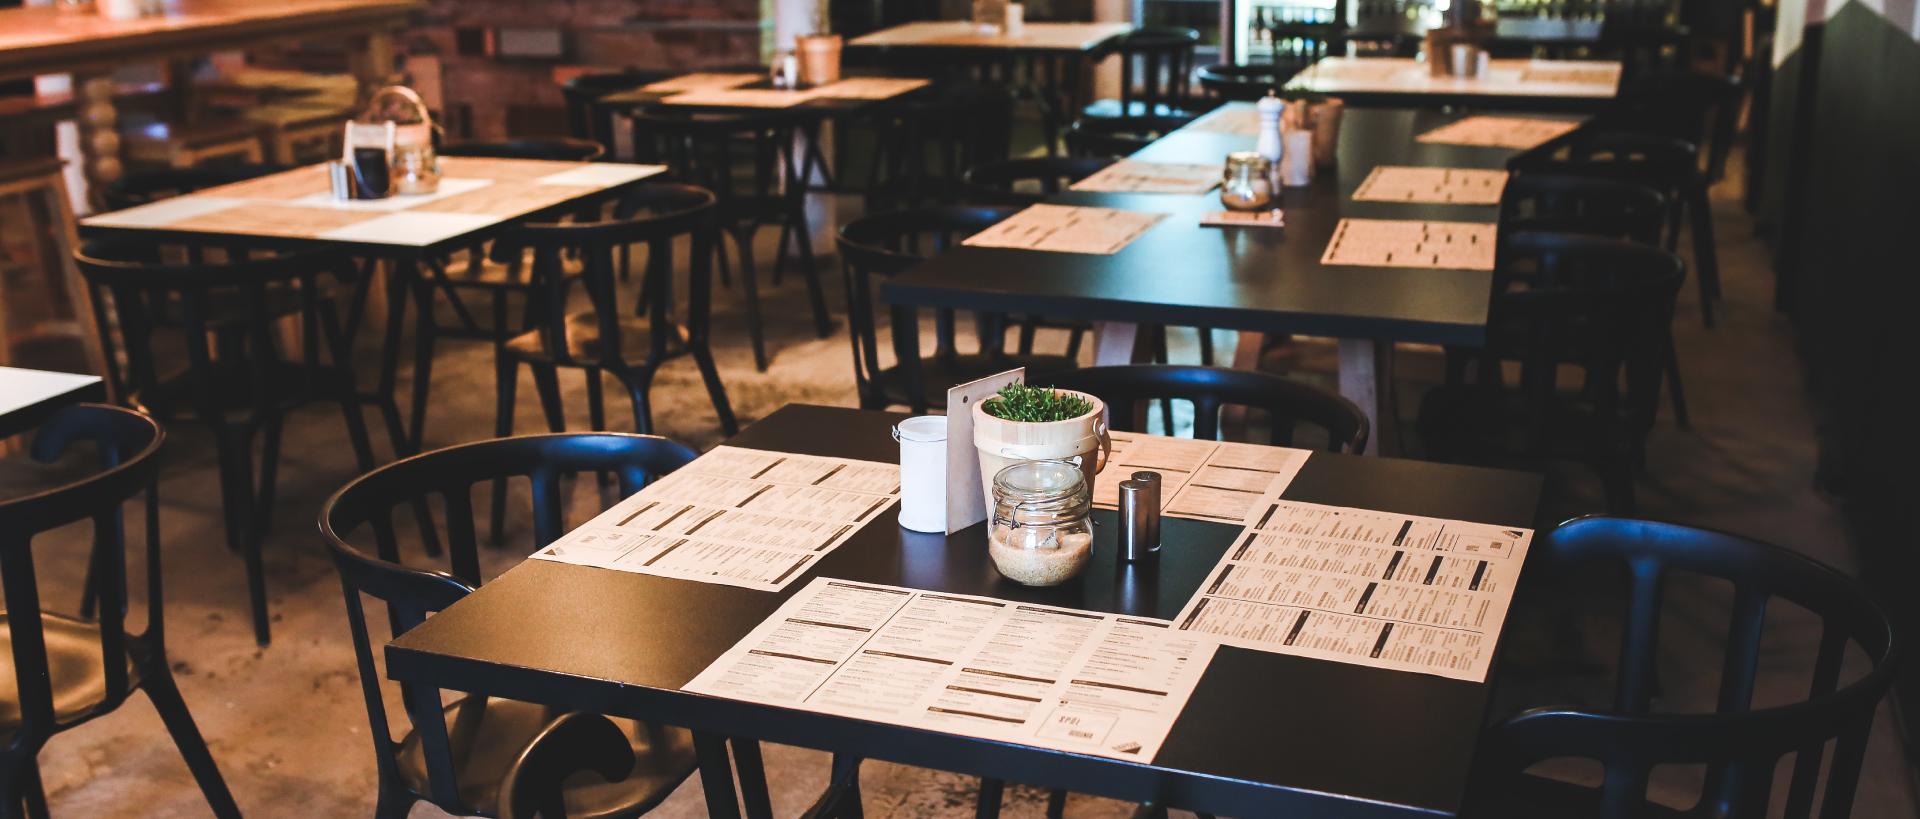 Restaurant Floor Plans: Maximizing Space & Productivity